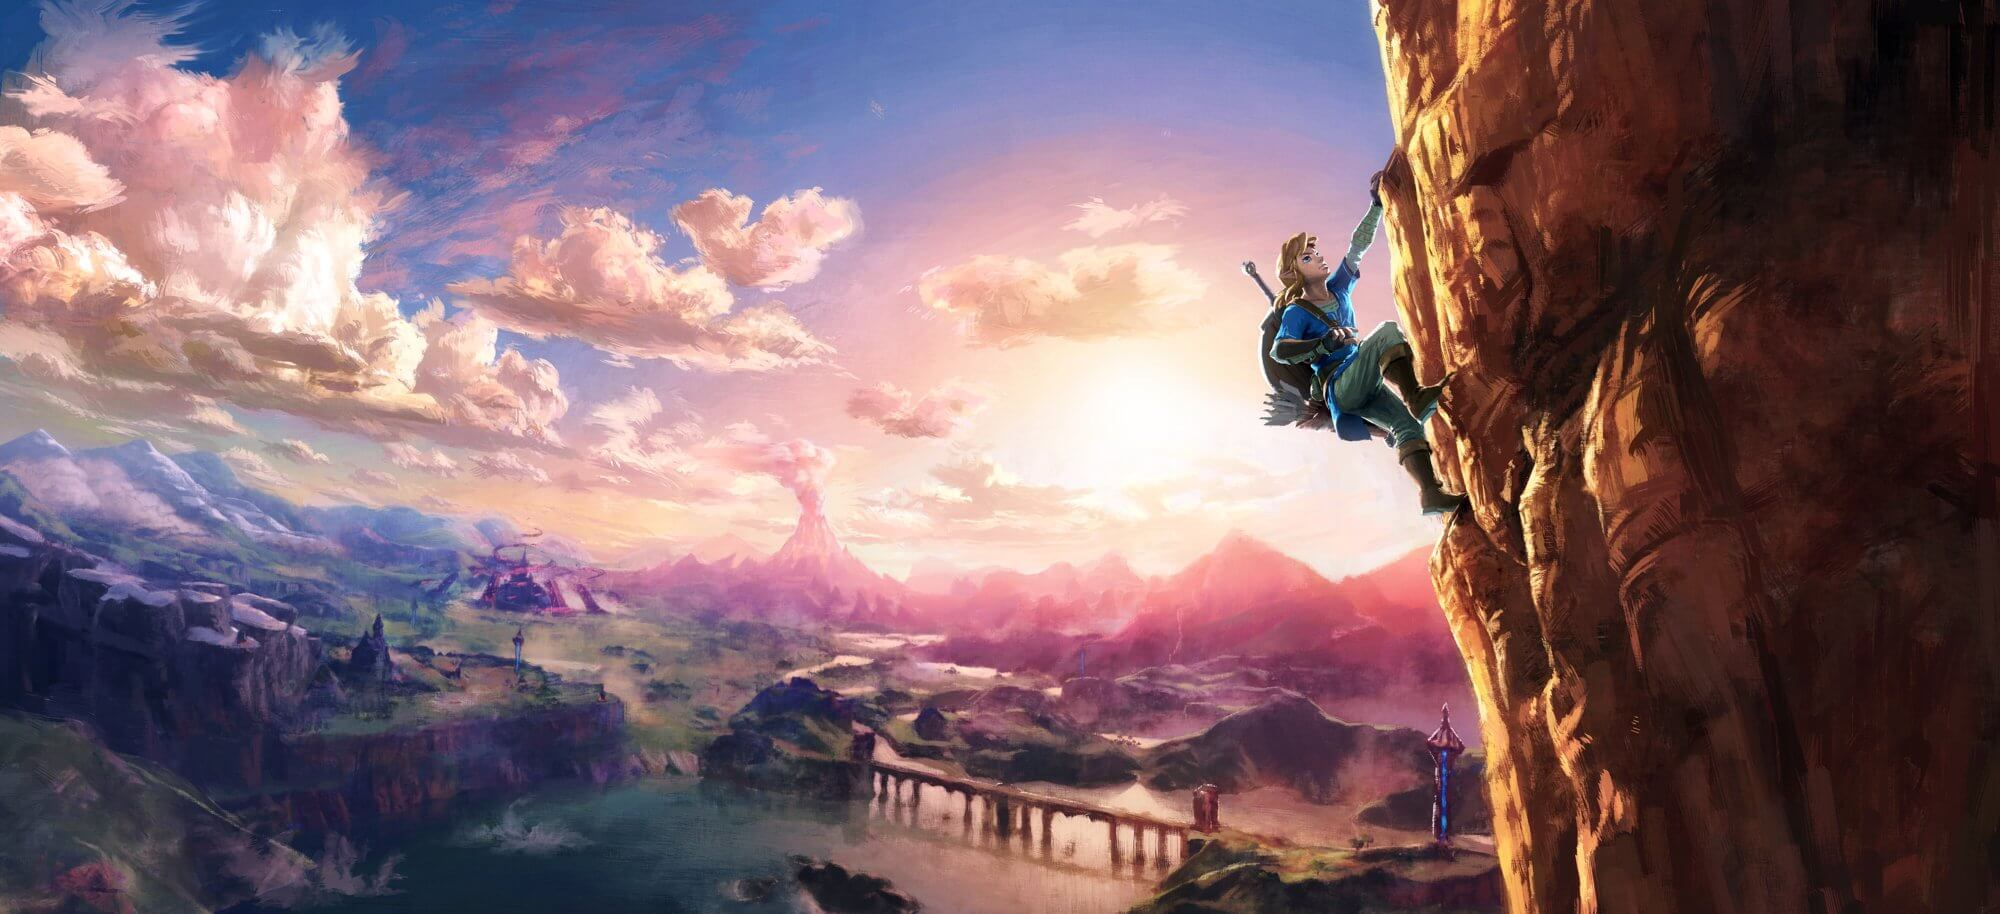 WiiU_TheLegendofZeldaBreathoftheWild_E32016_illust (1)